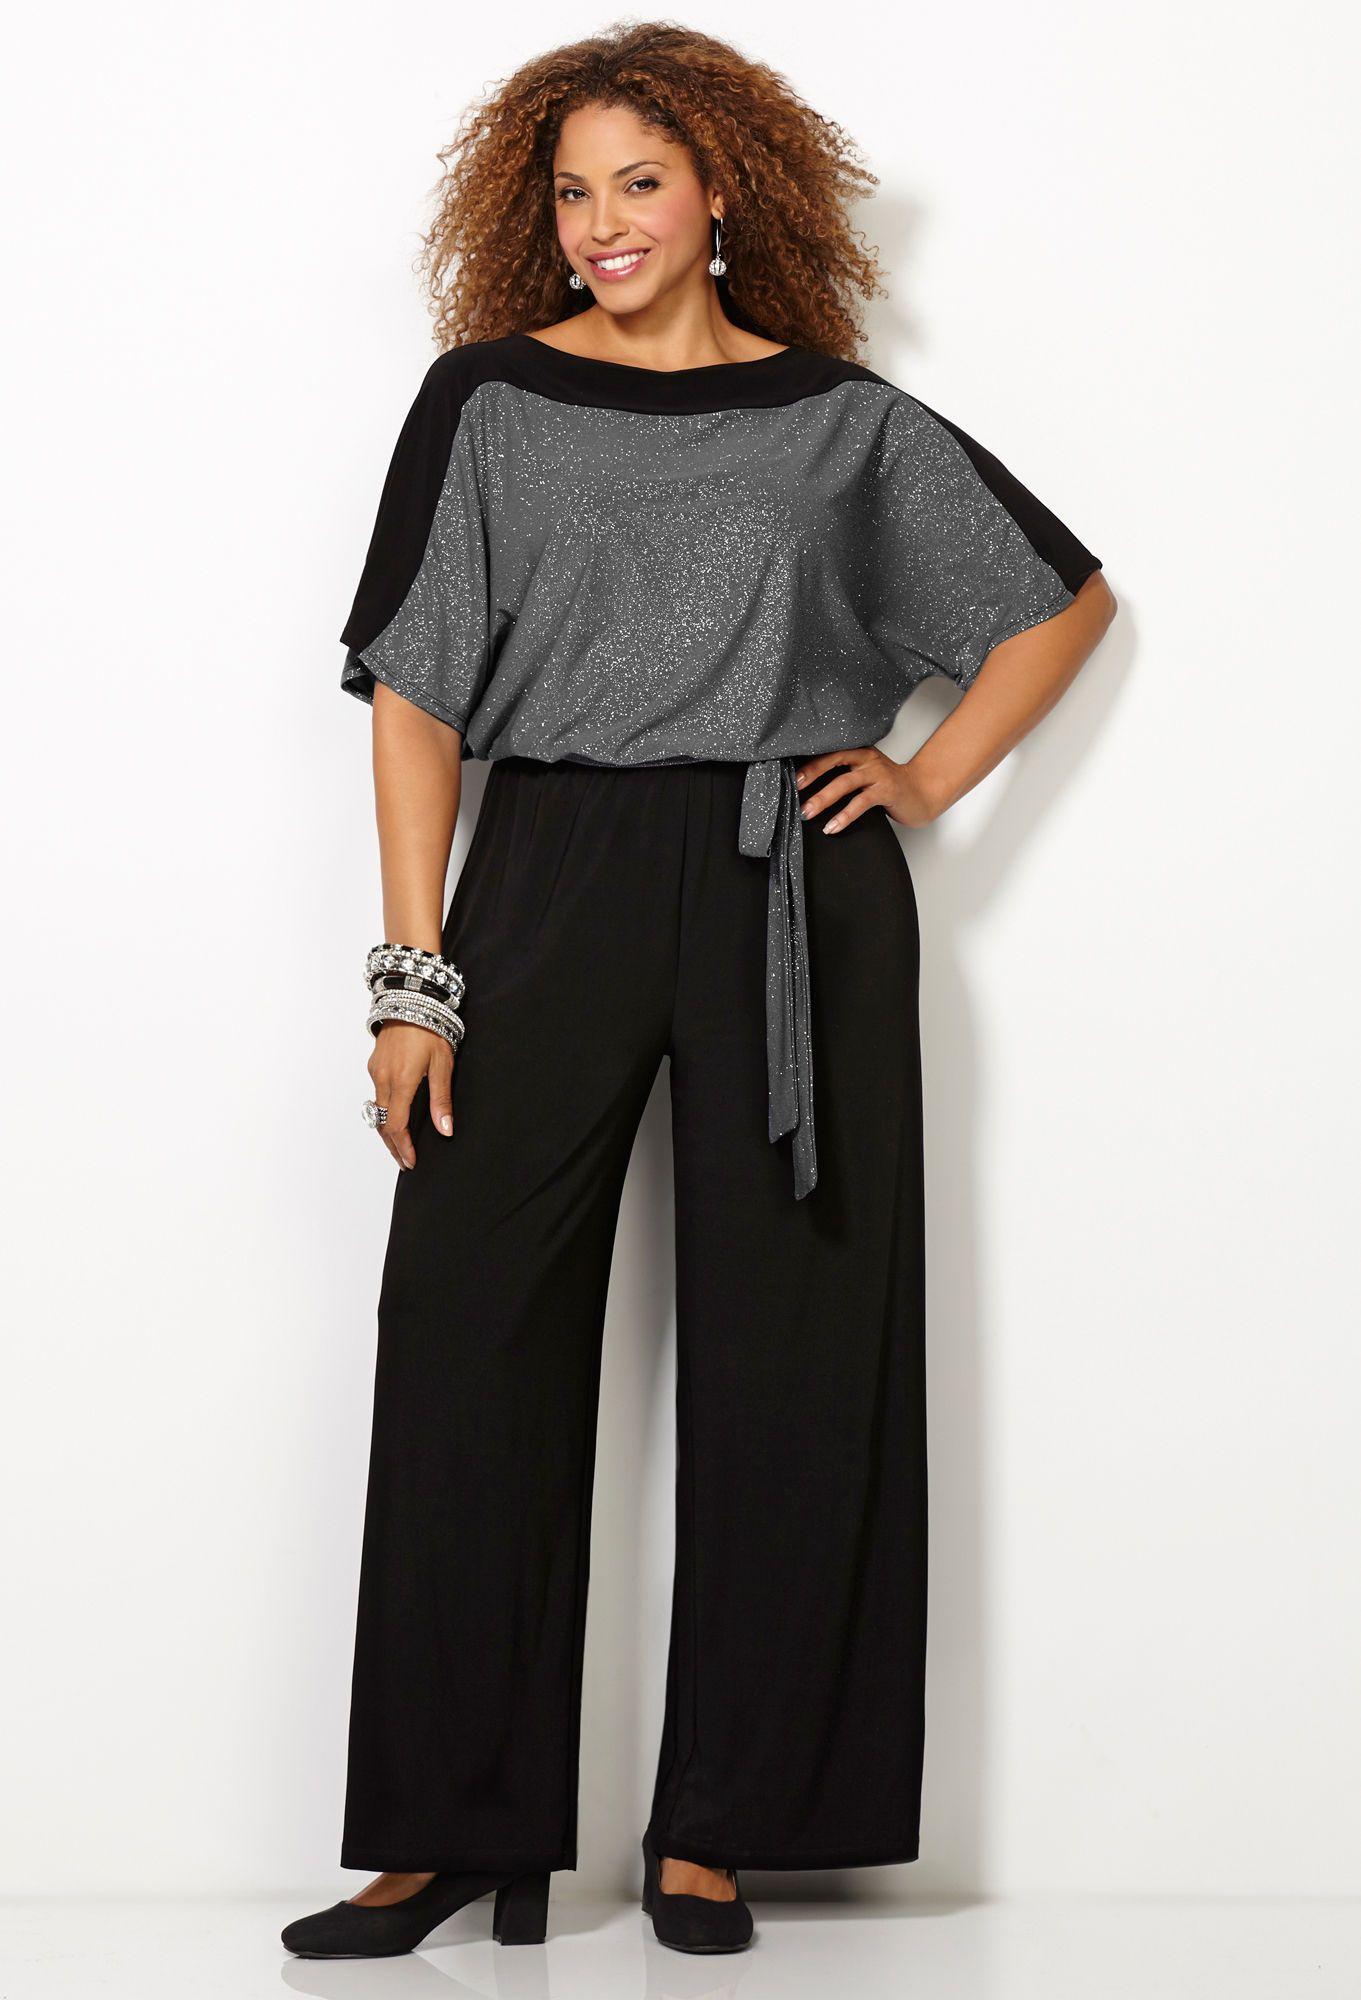 03e9224b5ec6 Shop Plus Size Maxi Dresses and Jumpsuits